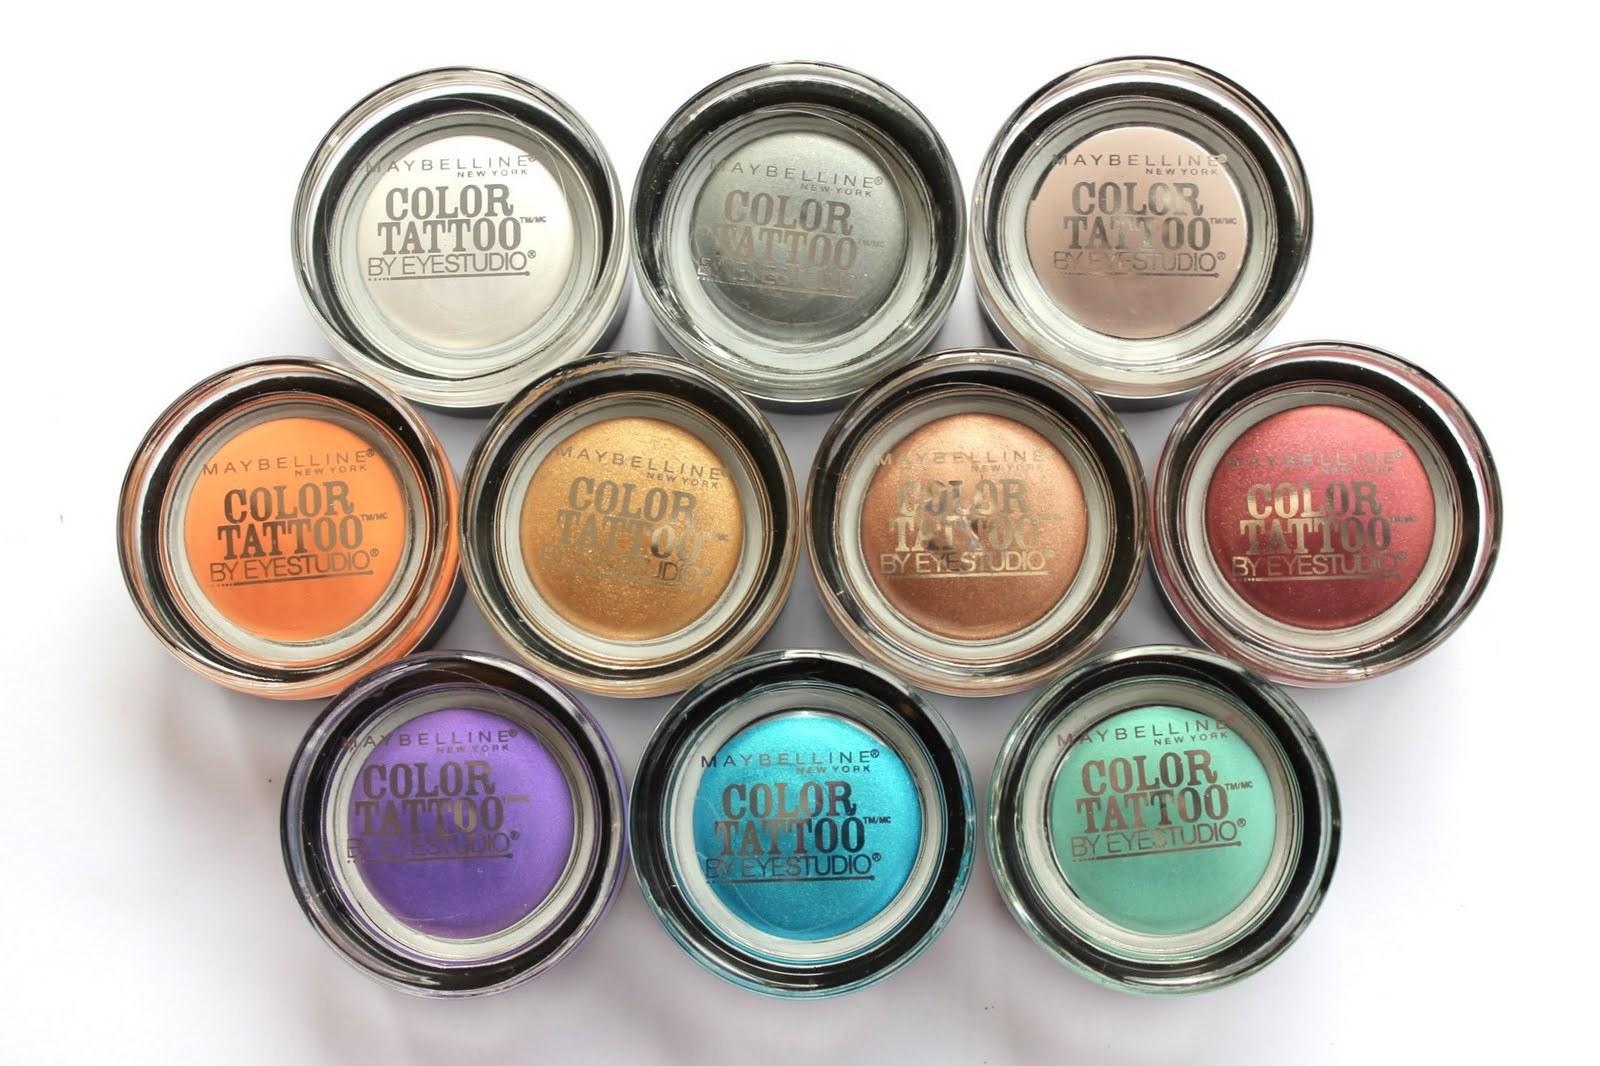 Maybelline Eye Studio Color Tattoo 24hr Cream Gel Eye Shadow Reviews